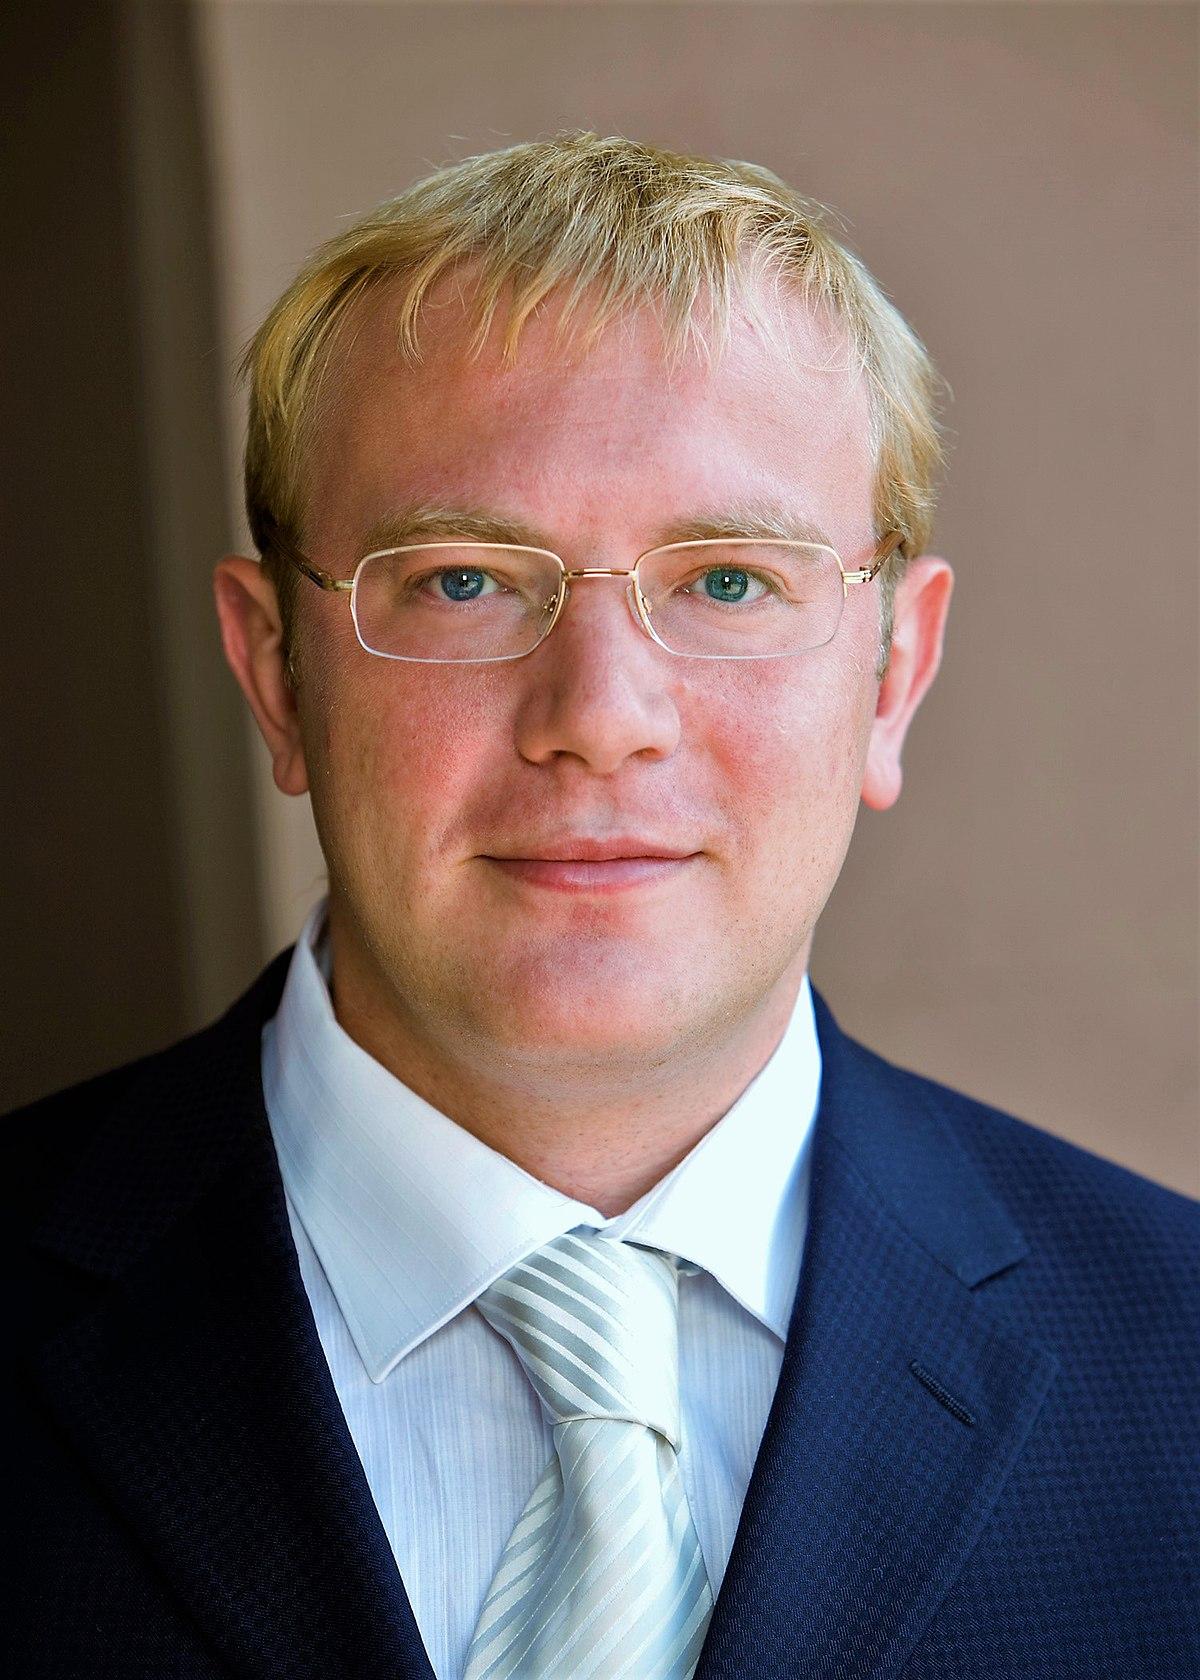 Andriy Shevchenko politician